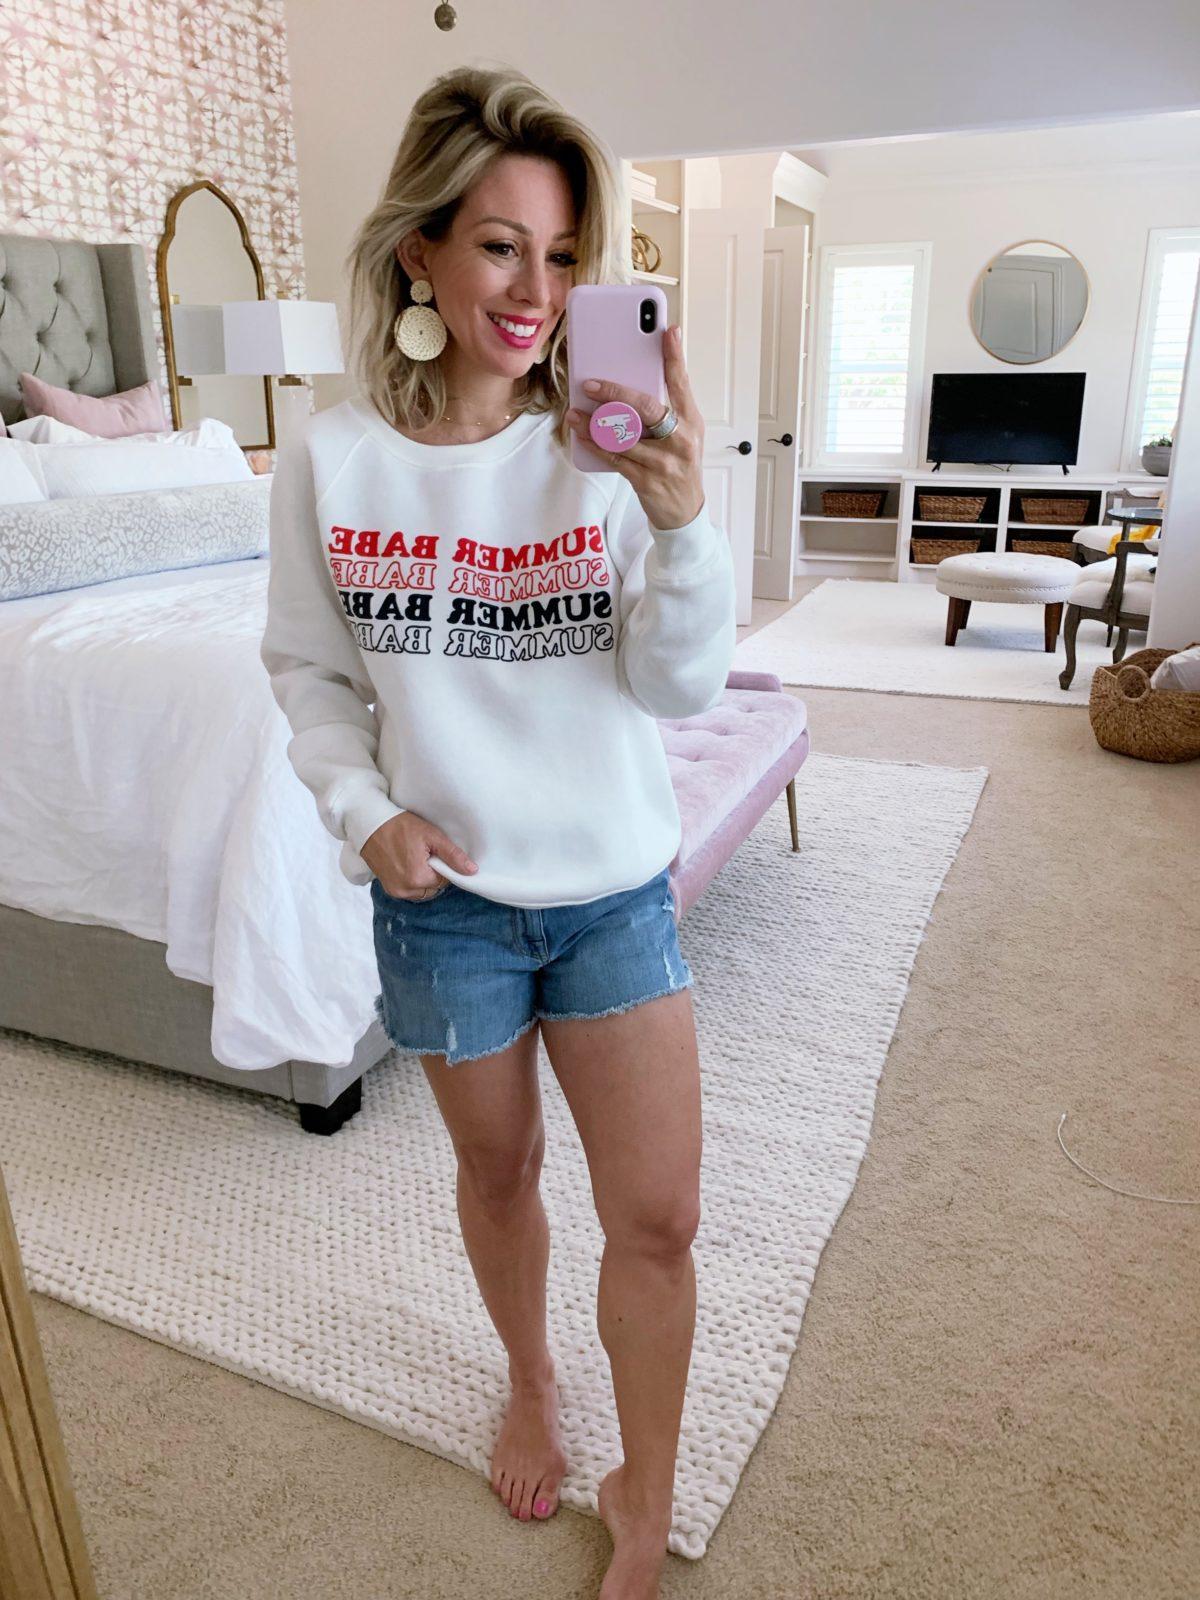 summer sweatshirt and jean shorts